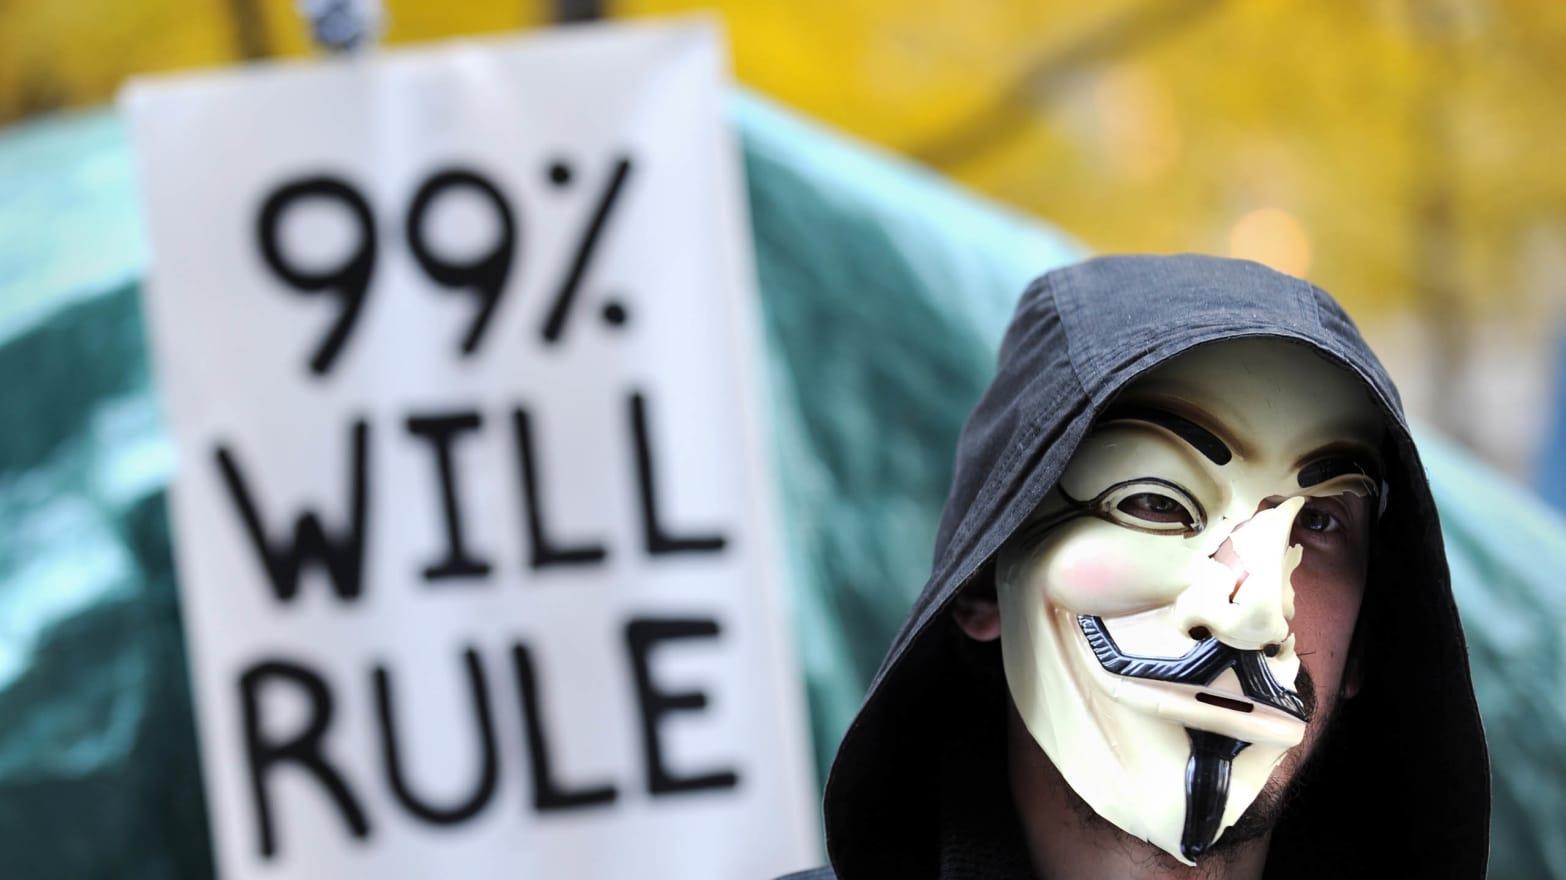 Progressive-palooza: On Obama, Occupy, and Moral Monday